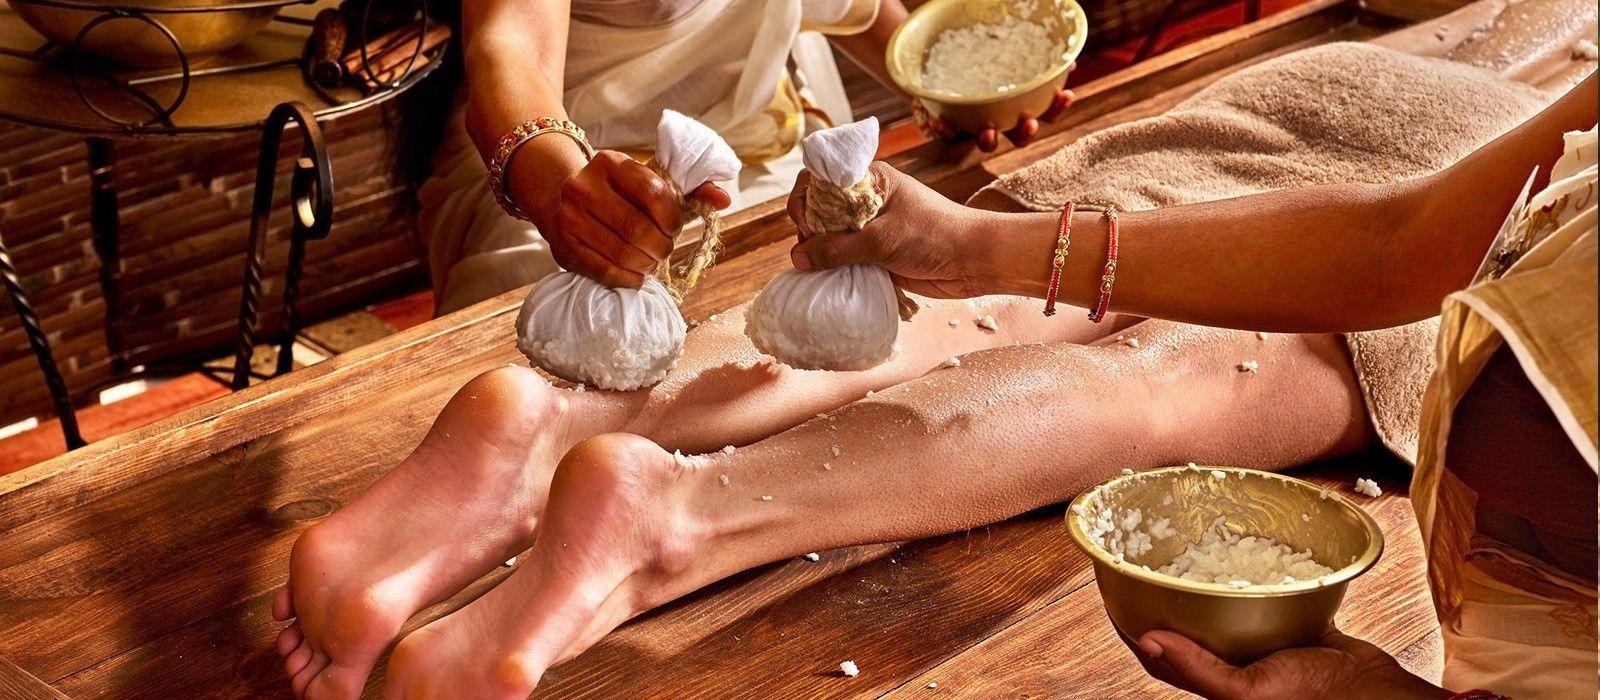 Ayurveda Reise: Erholung pur in Kerala Urlaub 4